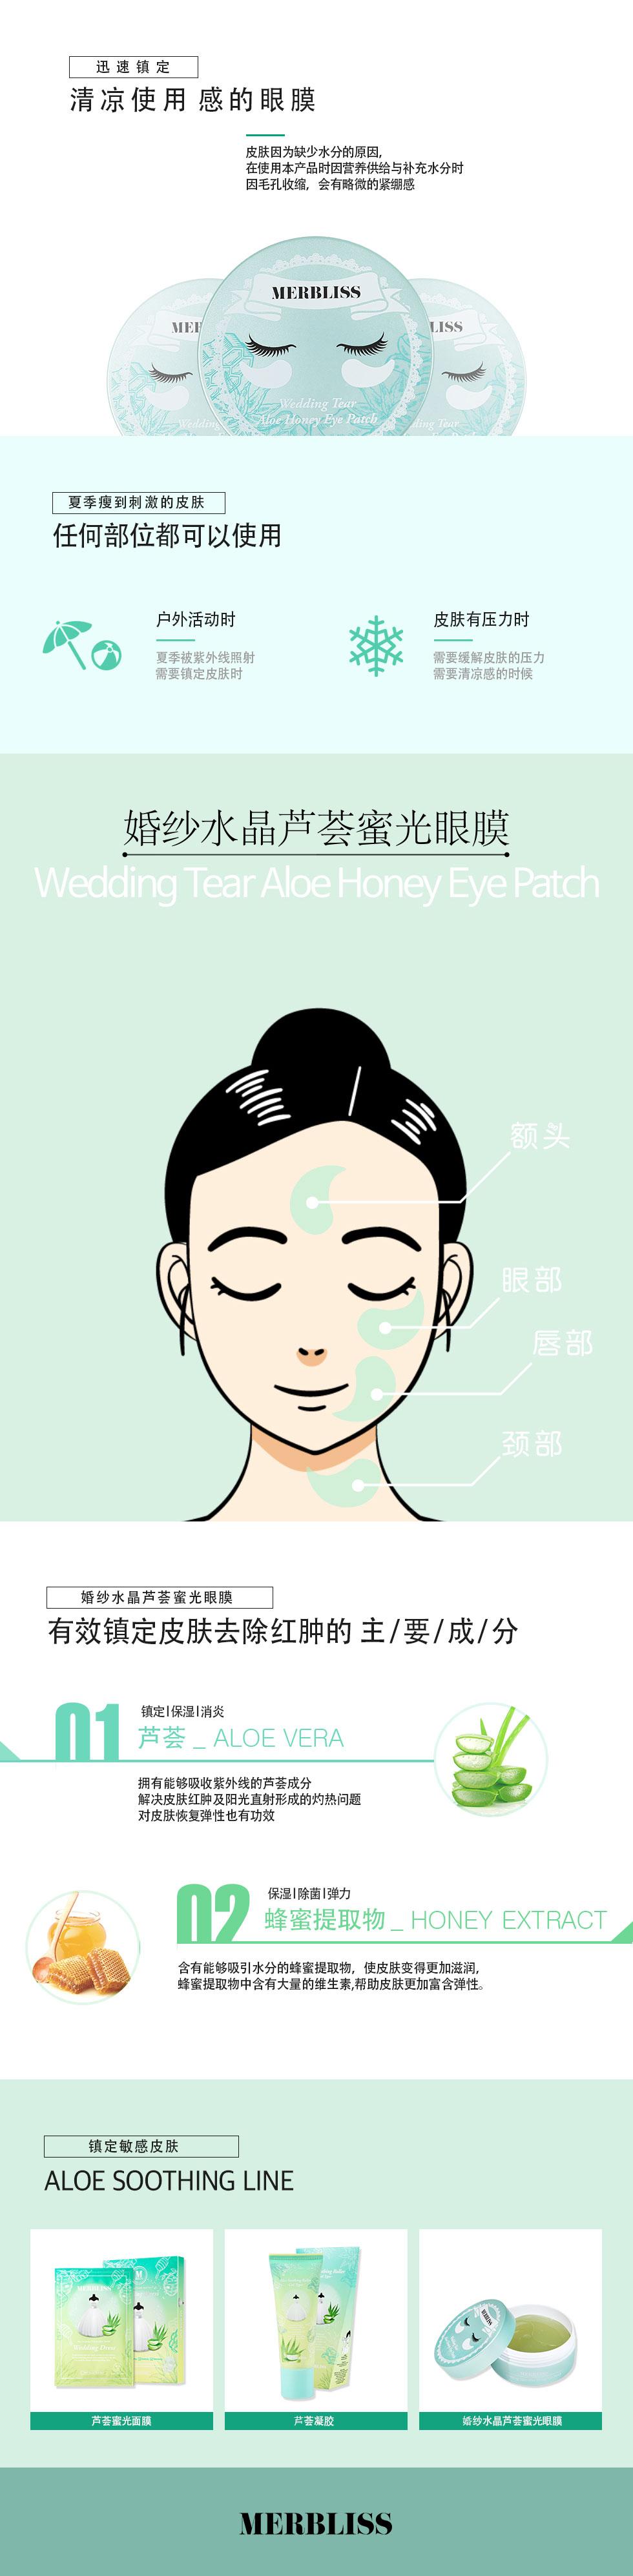 images-婚纱水晶芦荟蜜光眼贴100g-160枚详细页_02